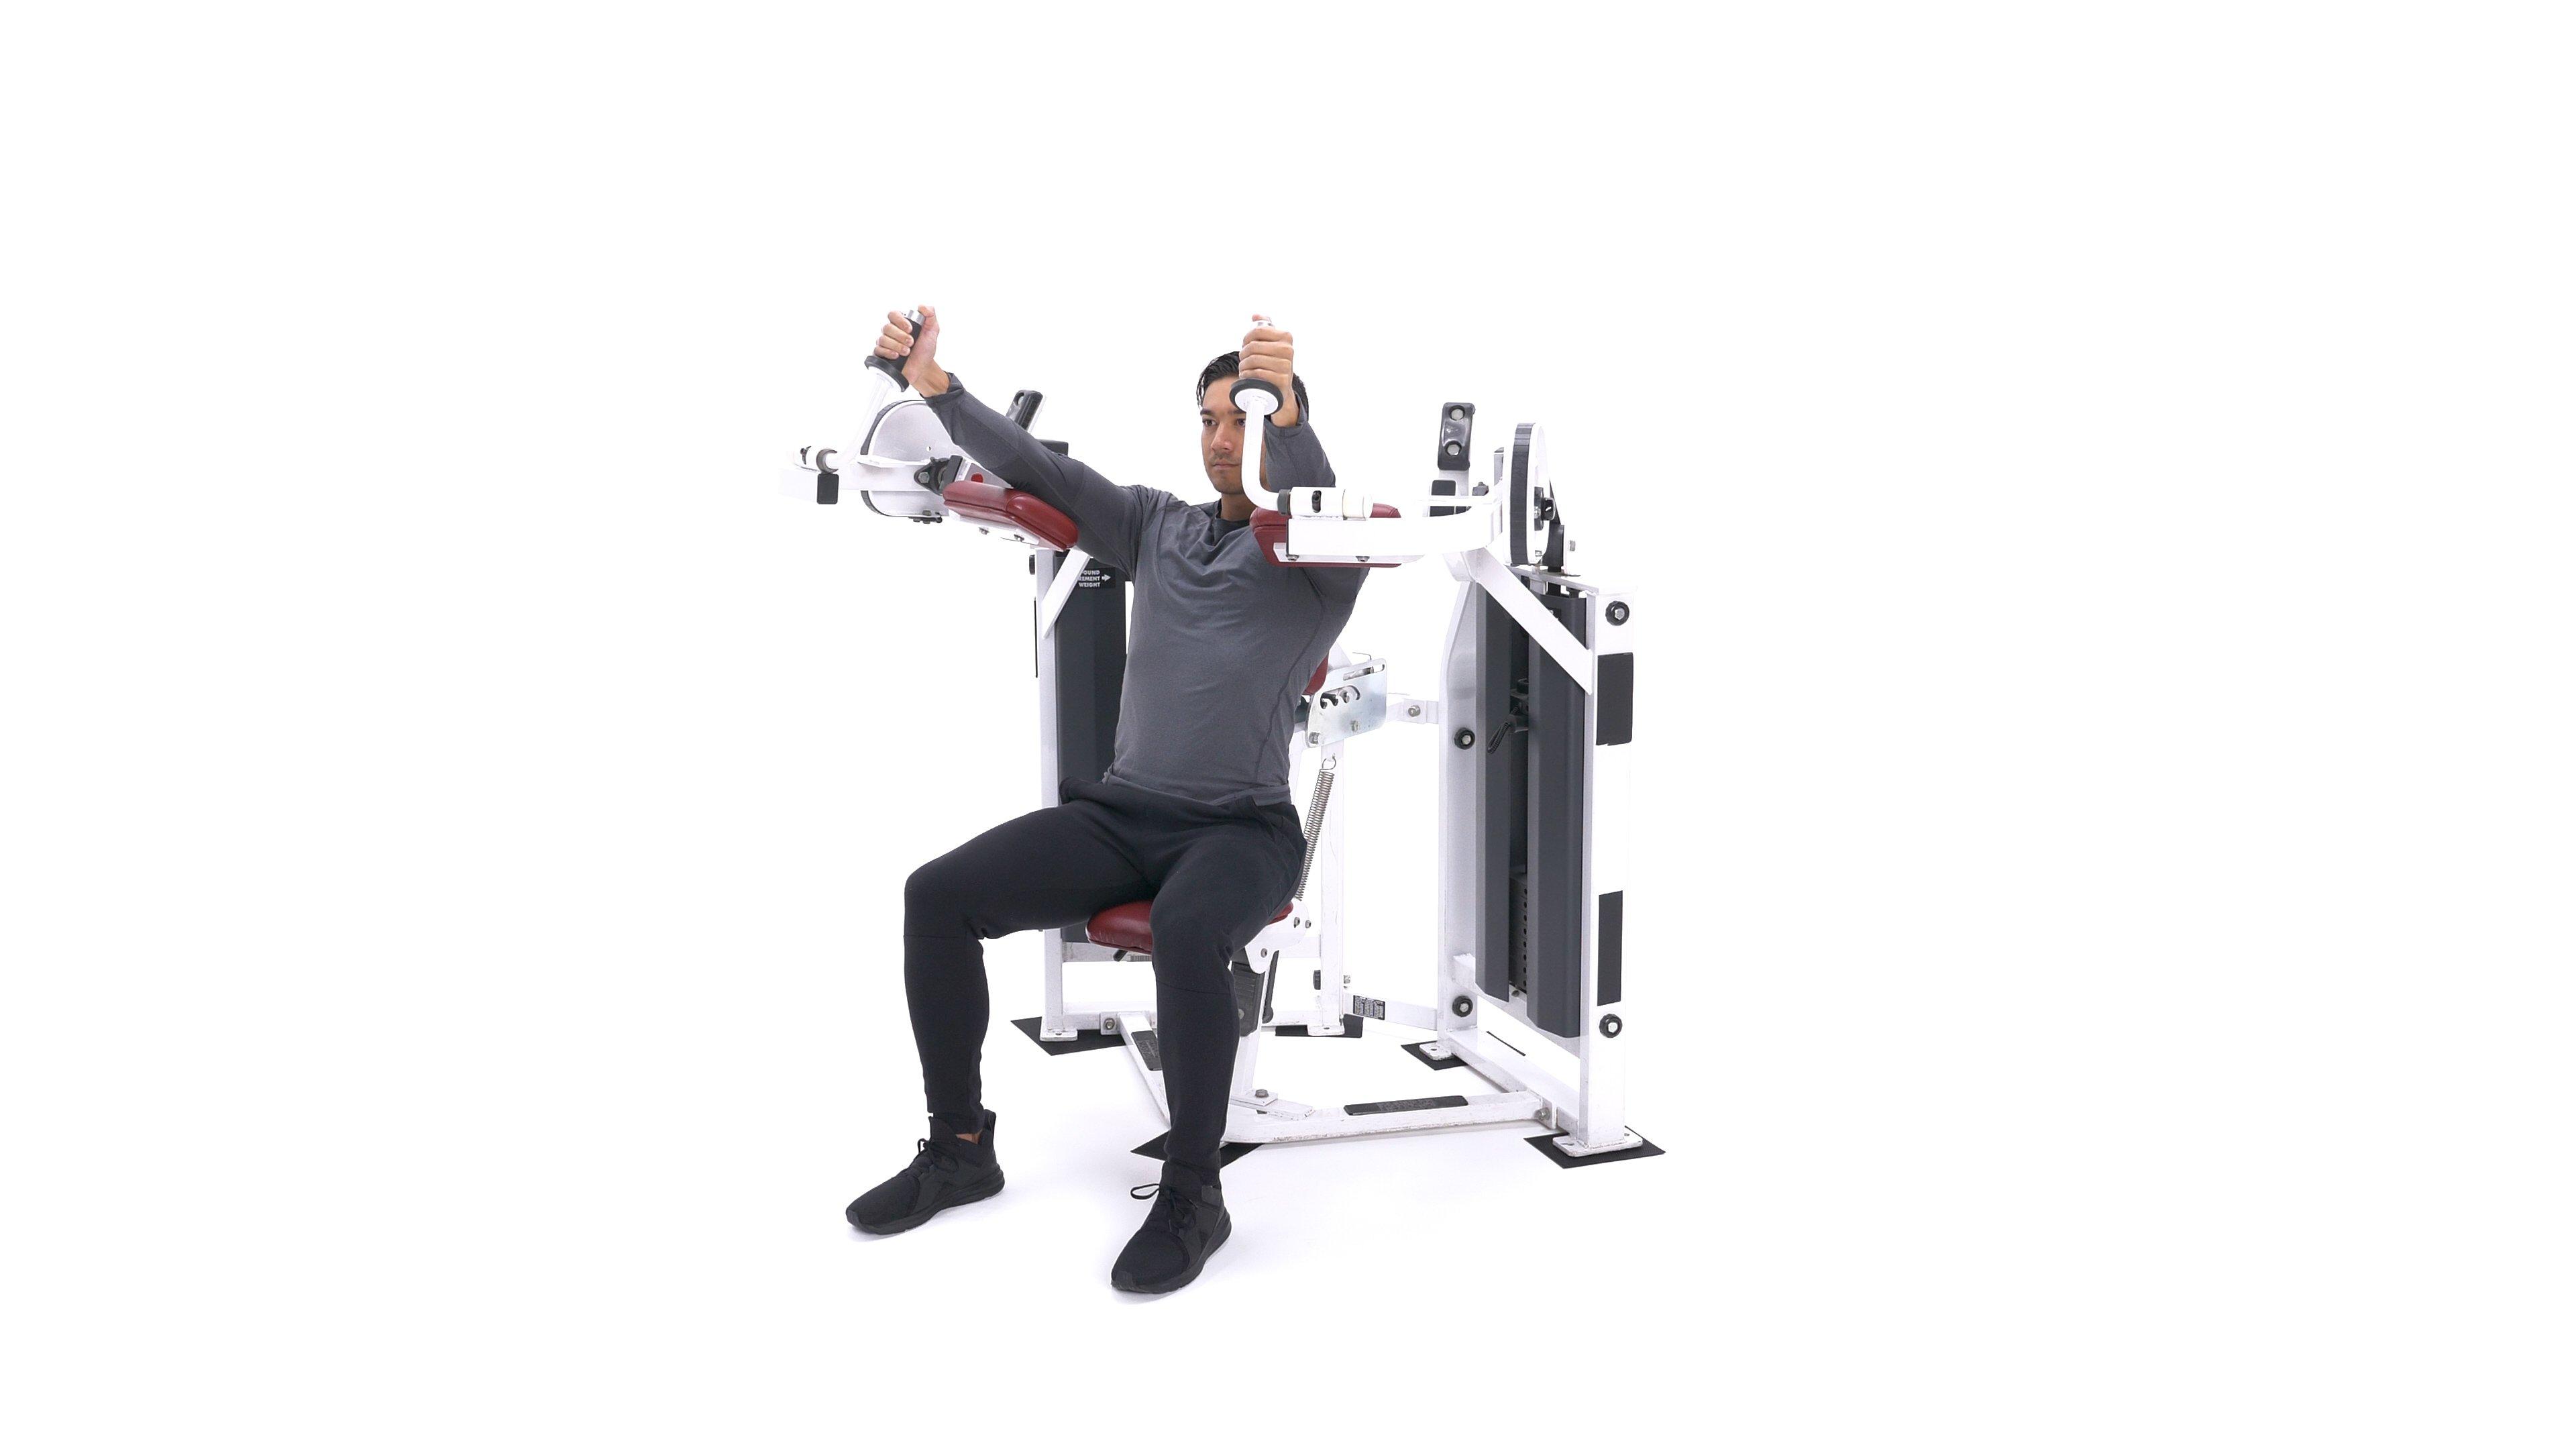 Machine Triceps Extension   Exercise Videos & Guides   Bodybuilding.com